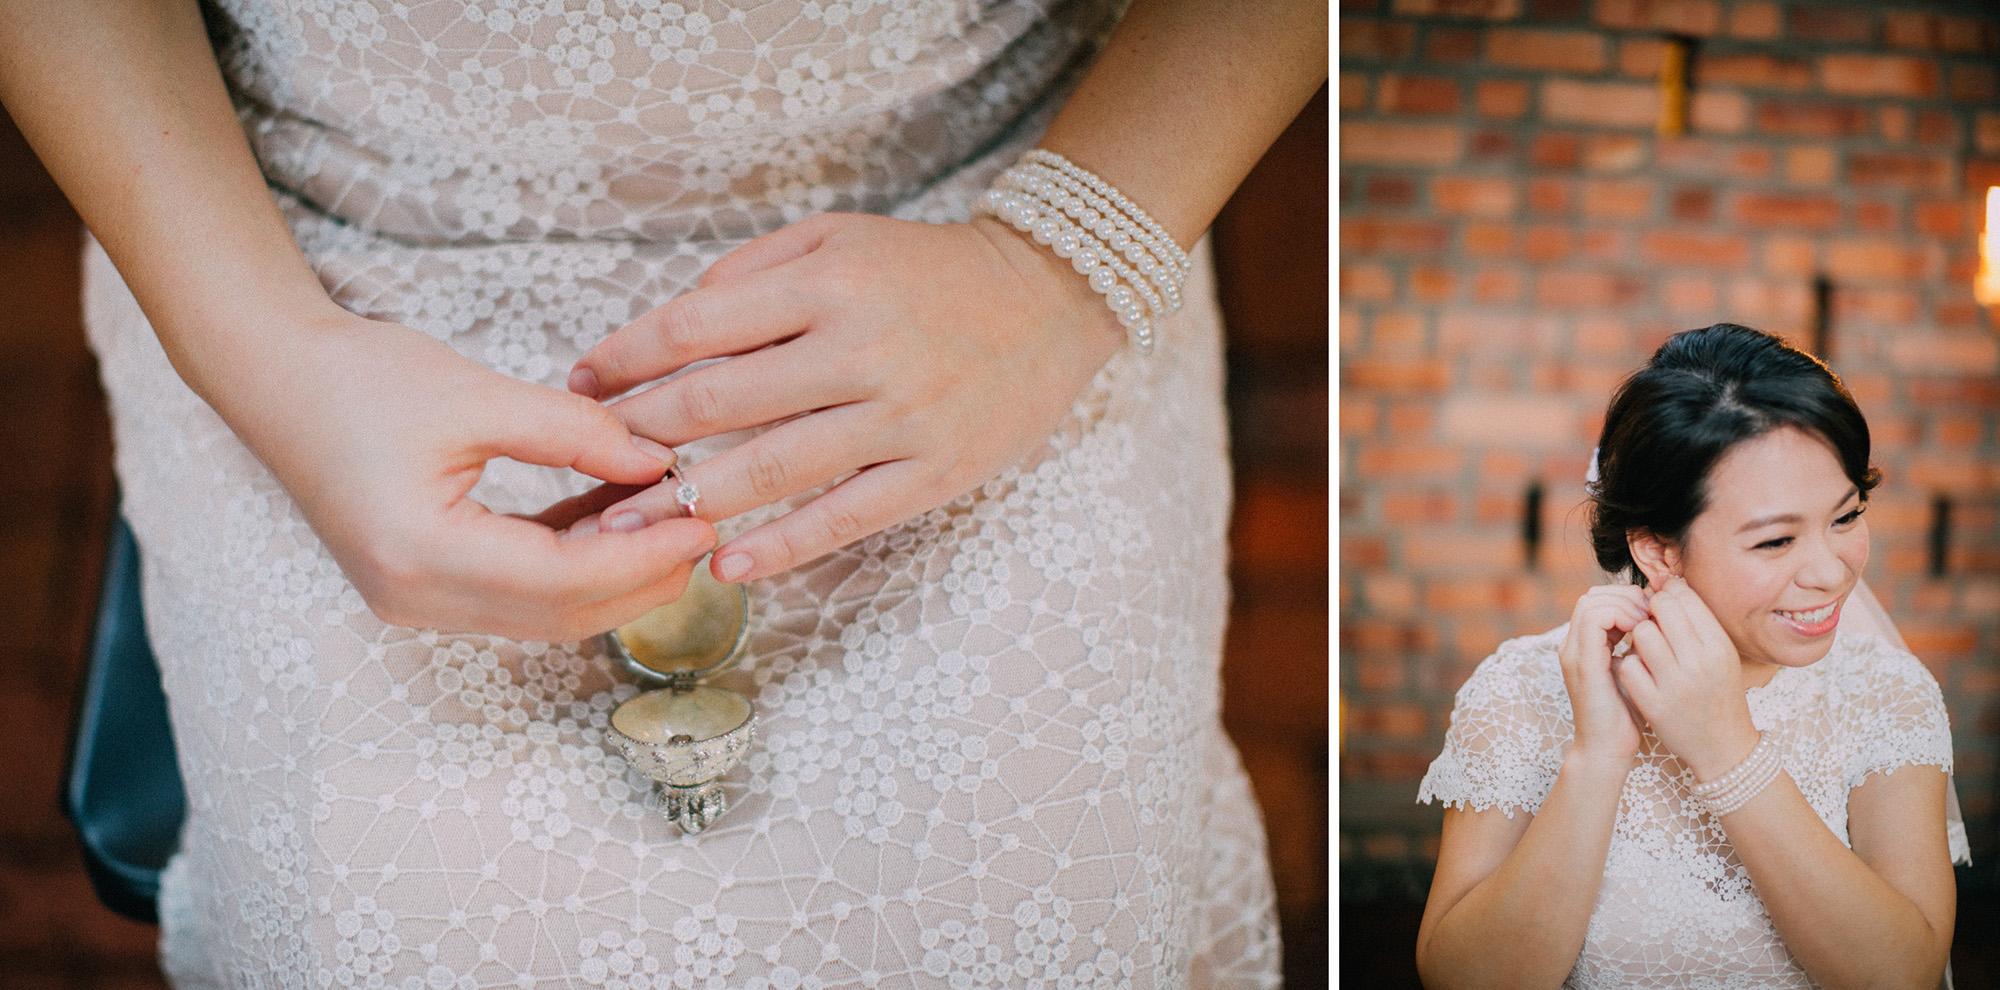 10-hellojanelee-sam grace-malaysia-wedding-day